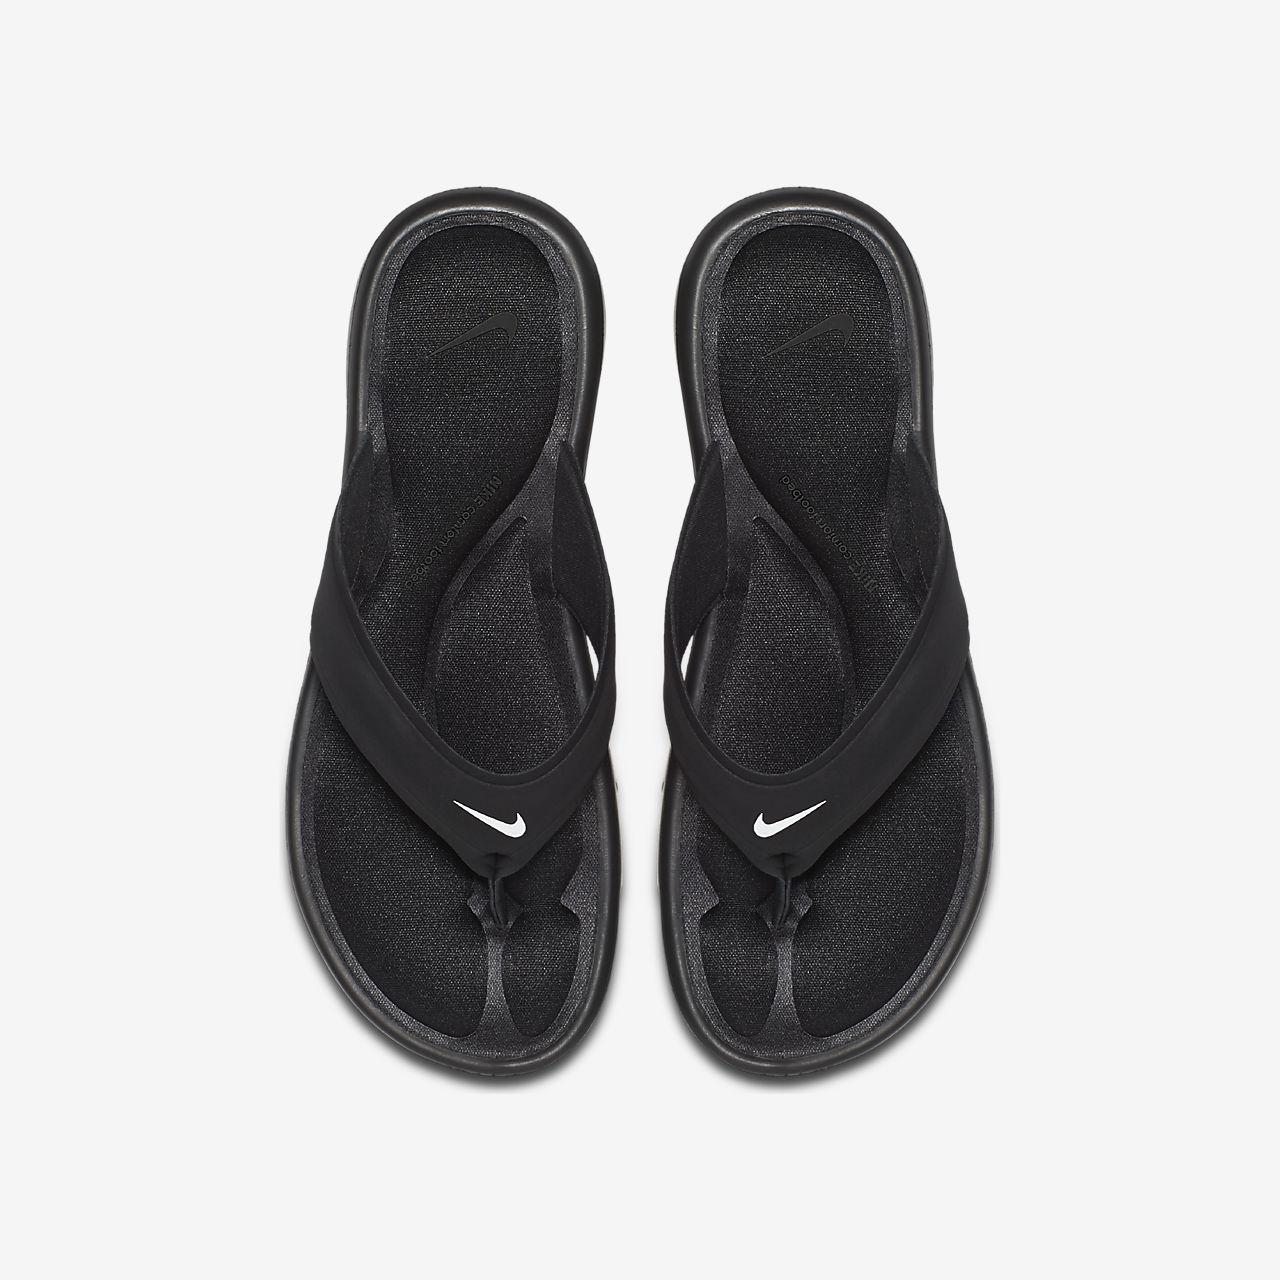 ... Nike Ultra Comfort Women's Flip Flop